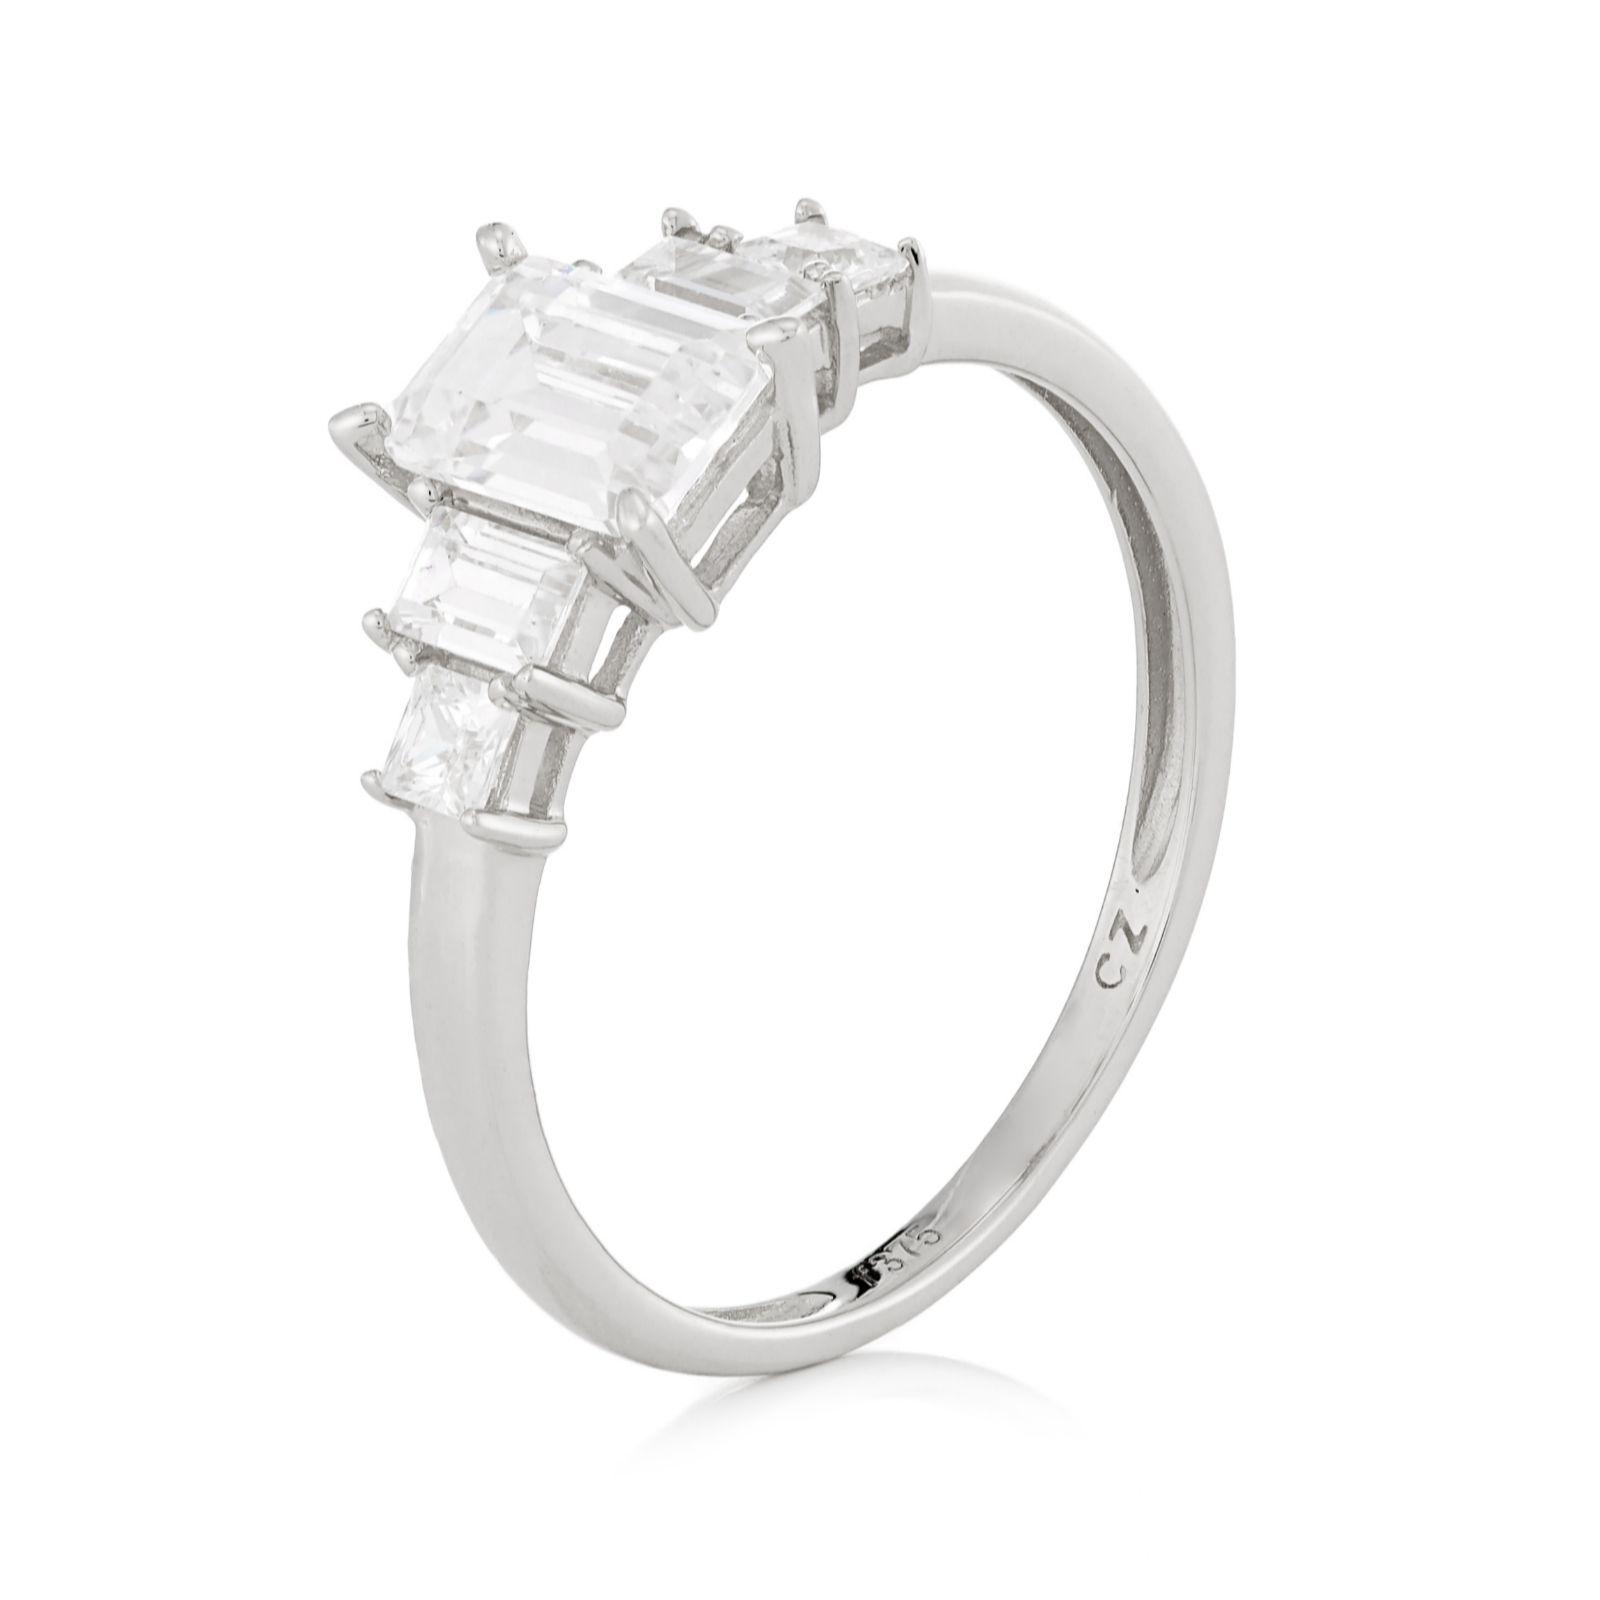 f74a1e990b2ec0 Diamonique 1.4ct tw Emerald Cut Ring 9ct Gold - QVC UK